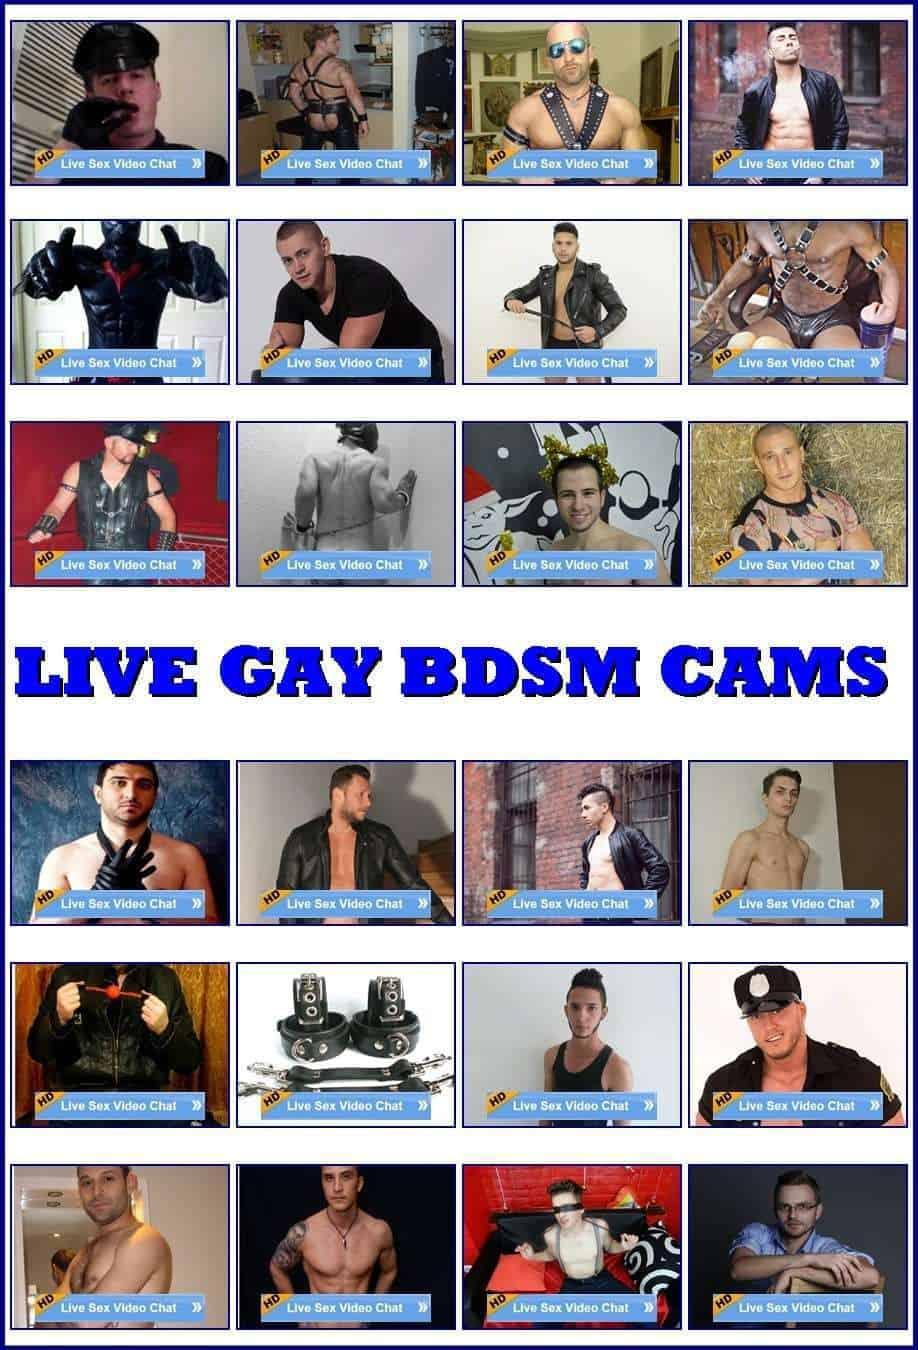 thaimassage stockholm happy end escort män göteborg gay